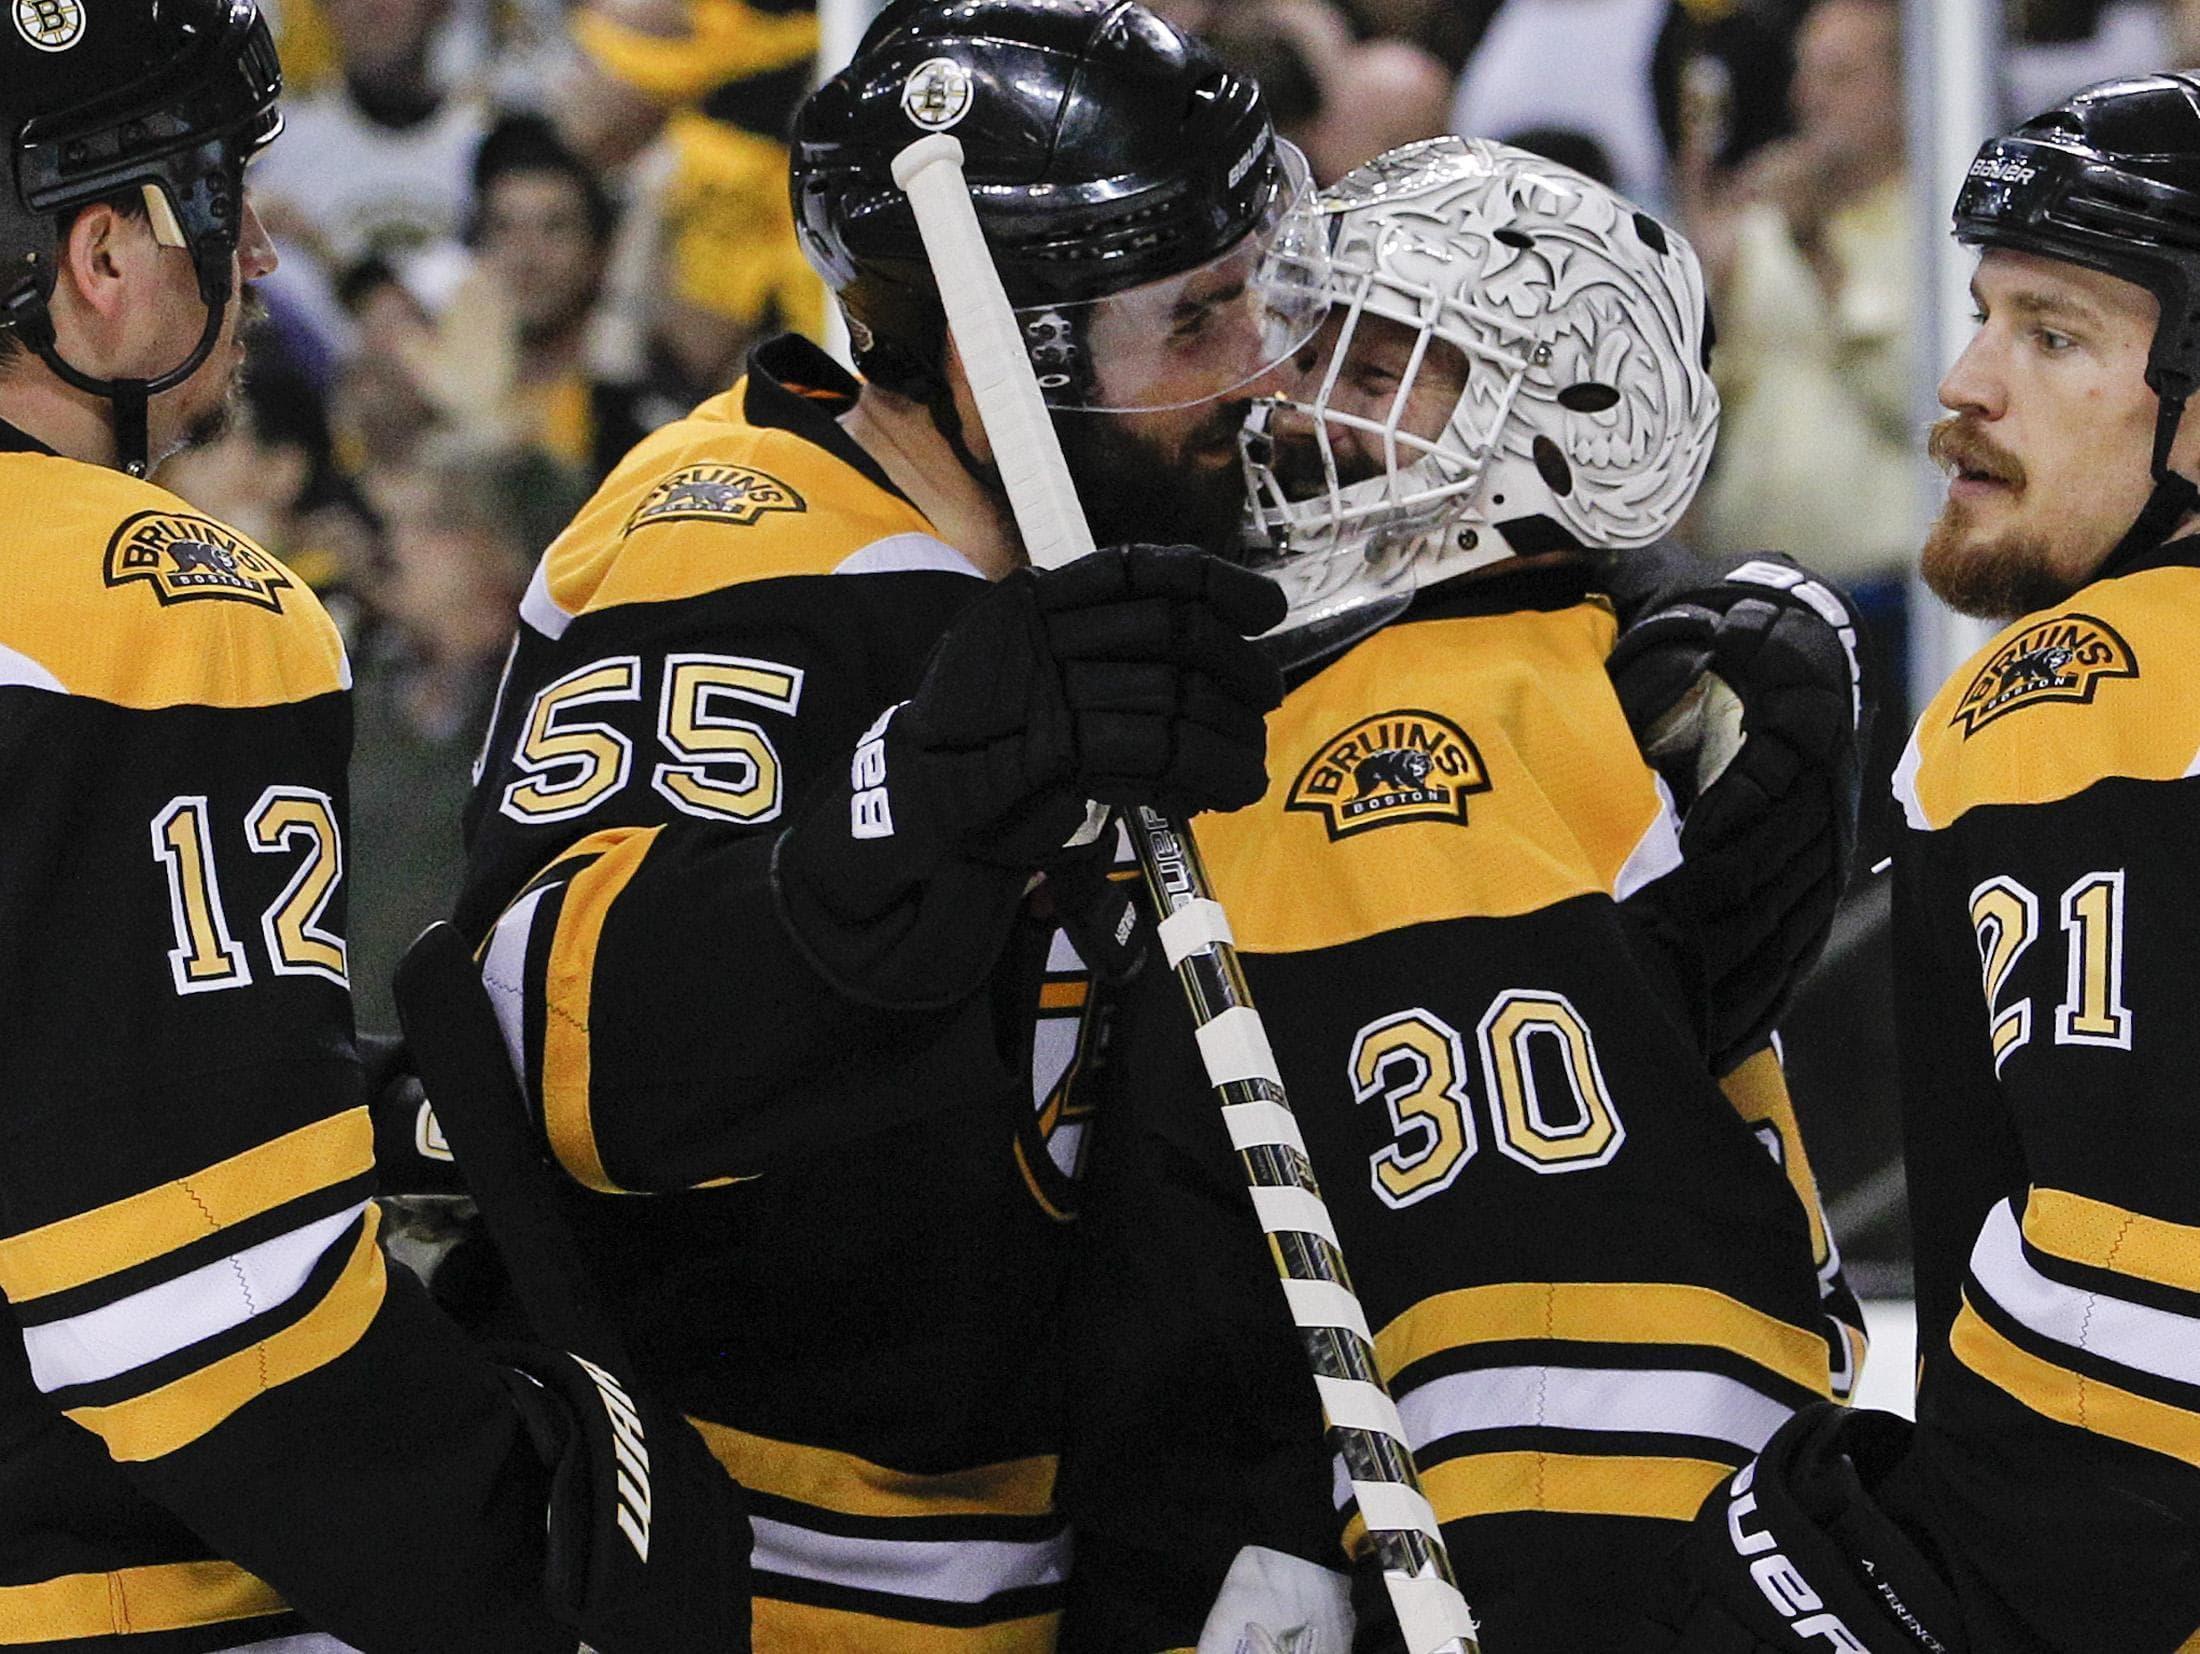 Bruins Batter Canucks 5 2 Force Game 7 Wbur News